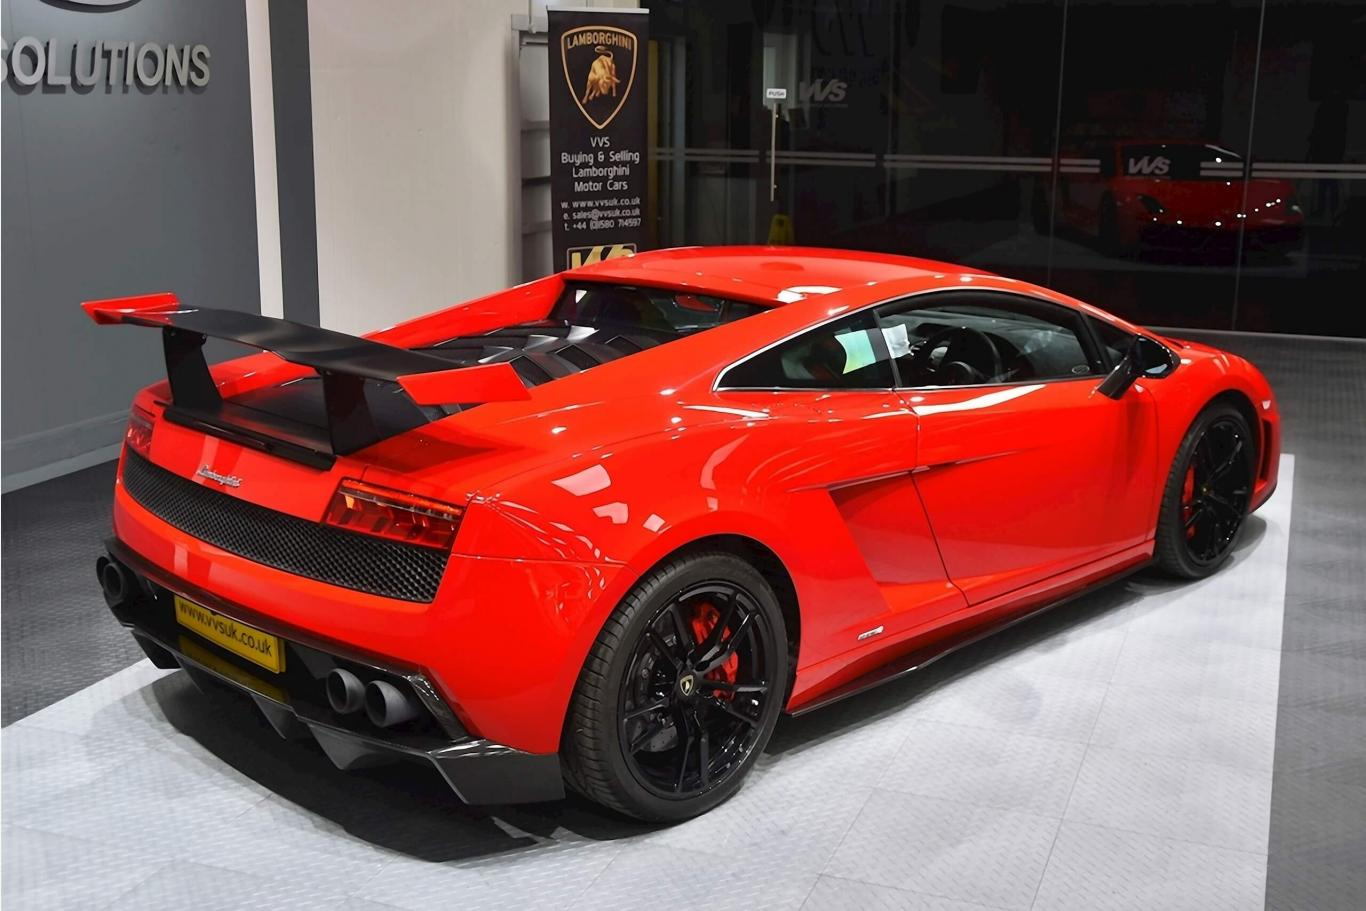 Lamborghini Super Trofeo >> Lamborghini Gallardo Lp570 4 Super Trofeo Stradale